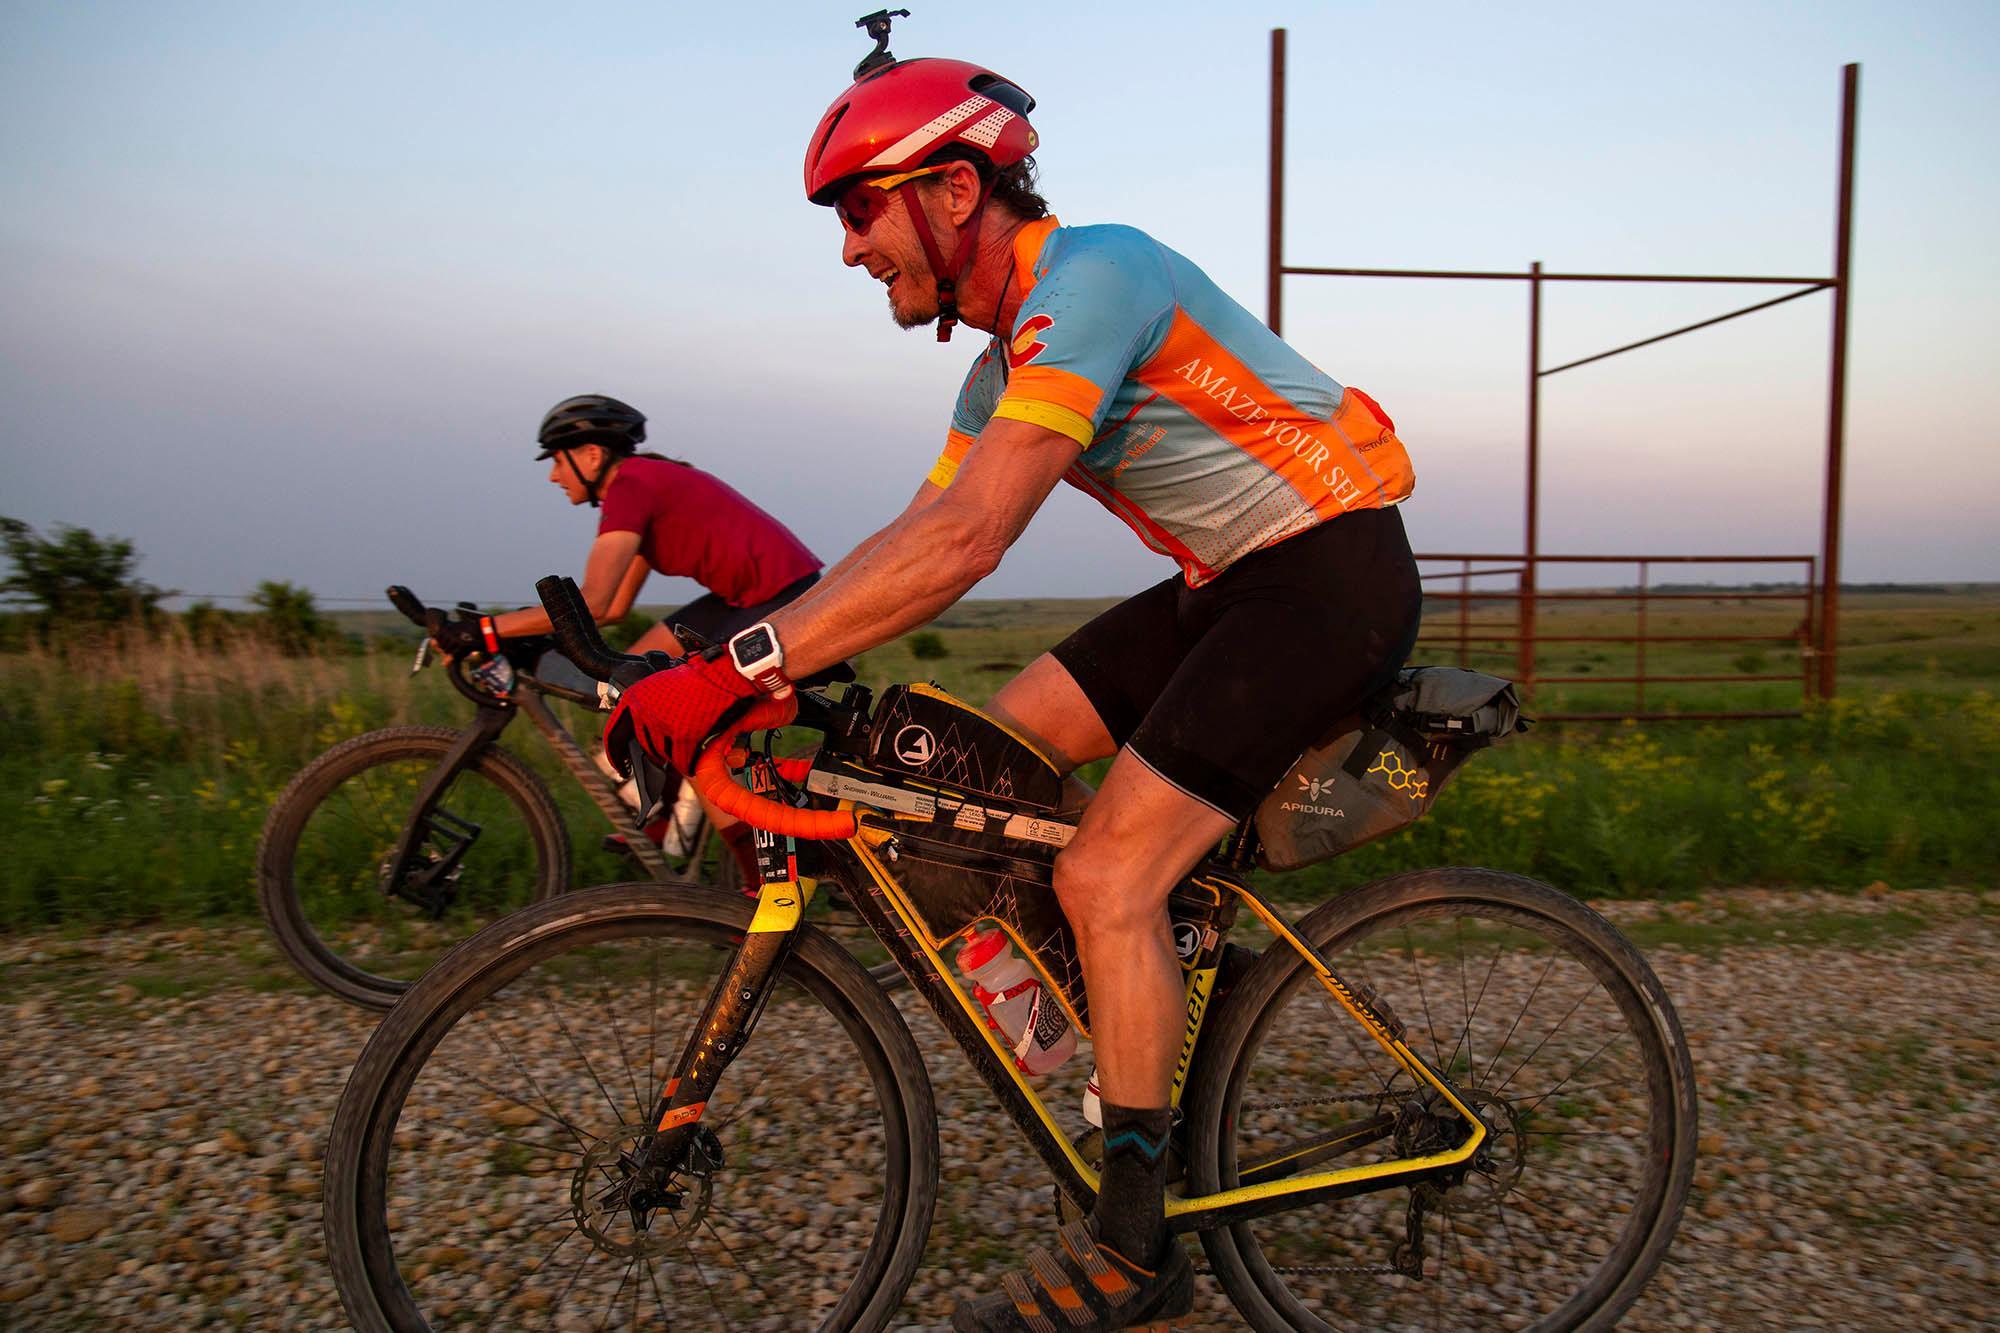 Lael rides with Morgan Murri in the DKXL 2019. (Rugile Kaladyte)